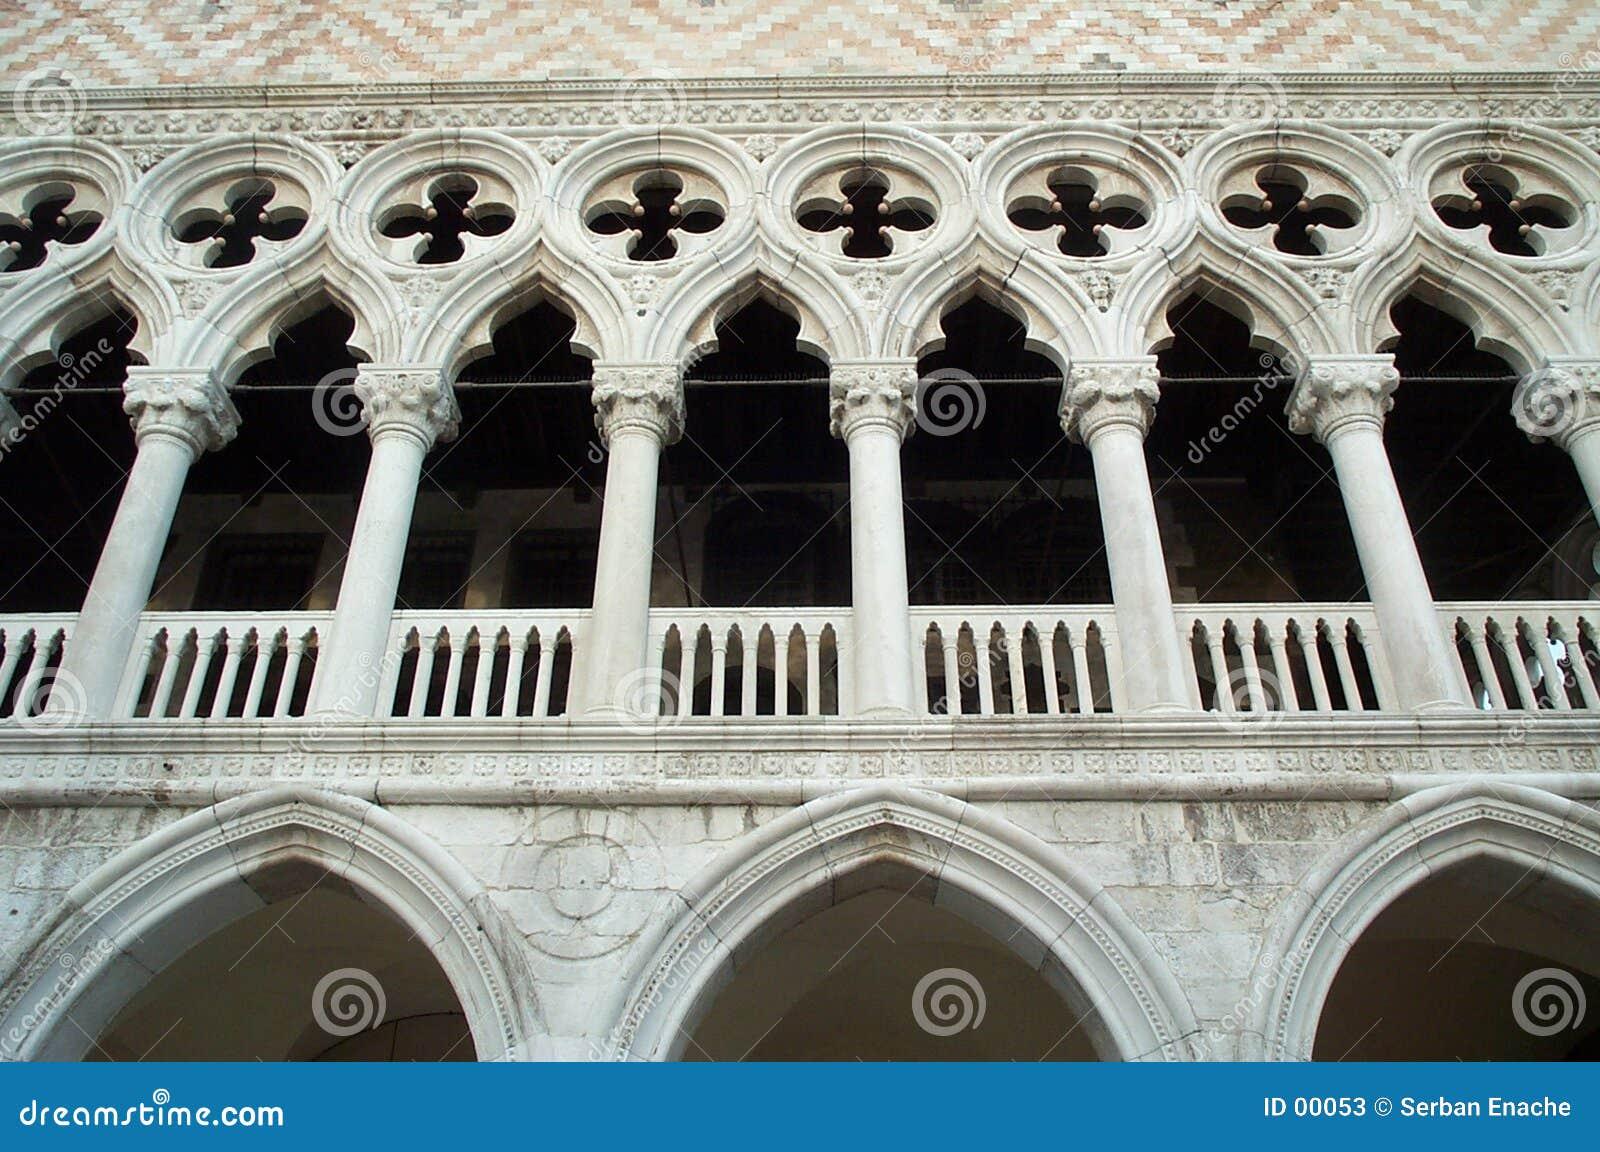 Dodge Palace - main facade